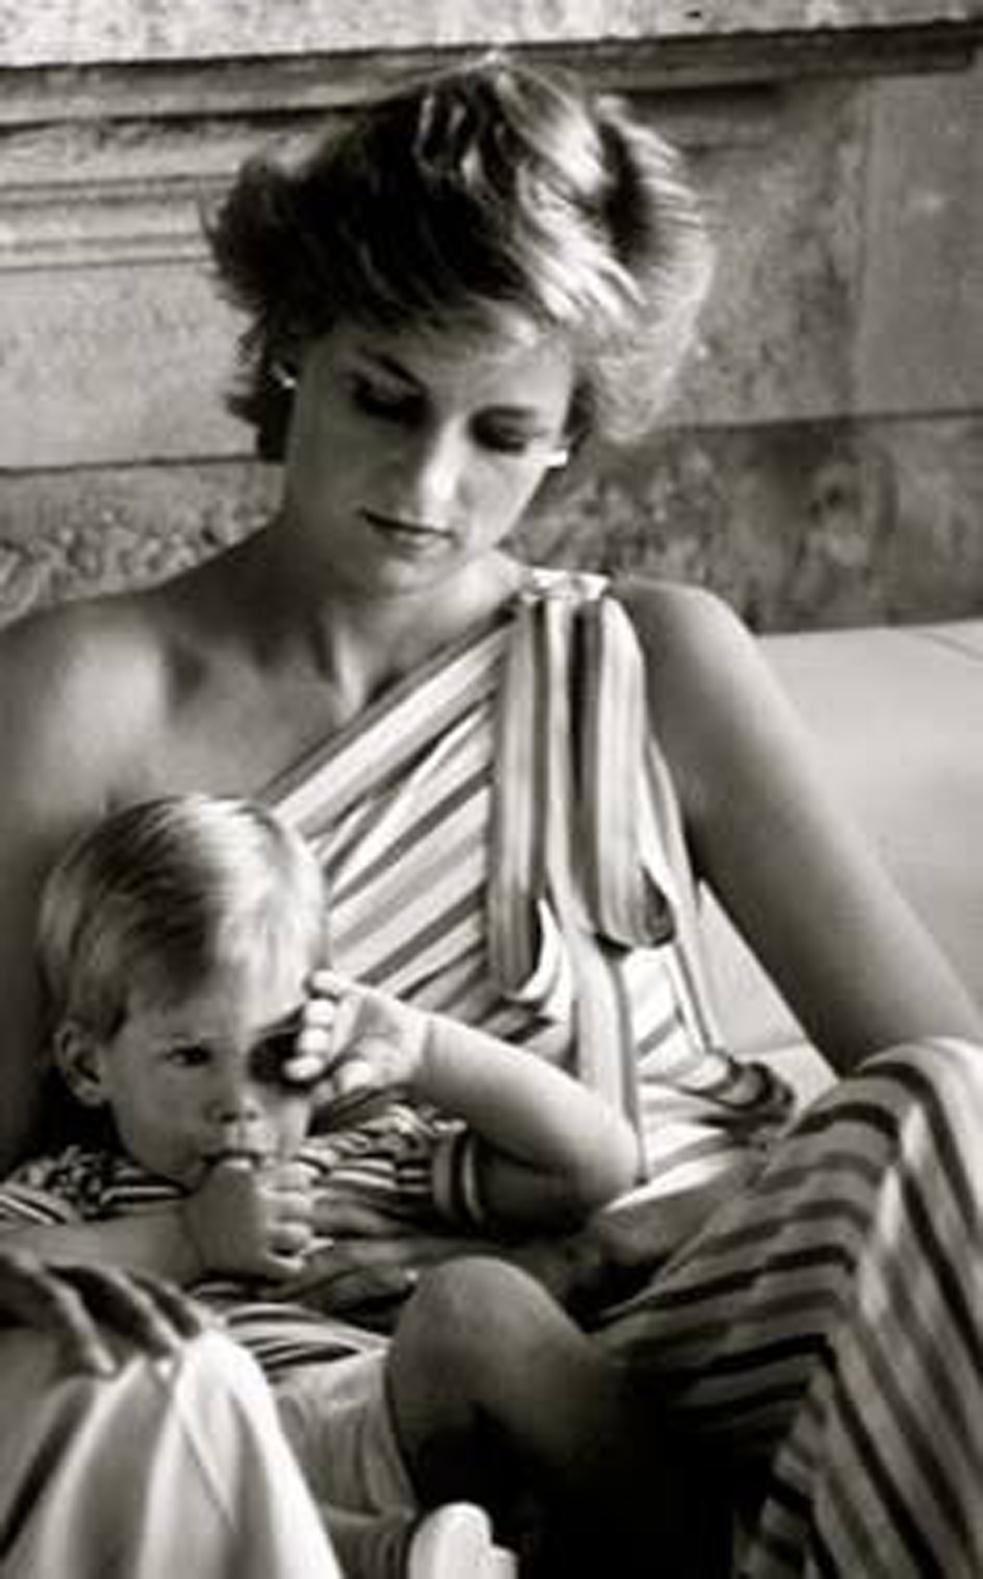 Princess Diana News Blog: Miss Spenser's Blog: Happy Birthday To Princess Diana